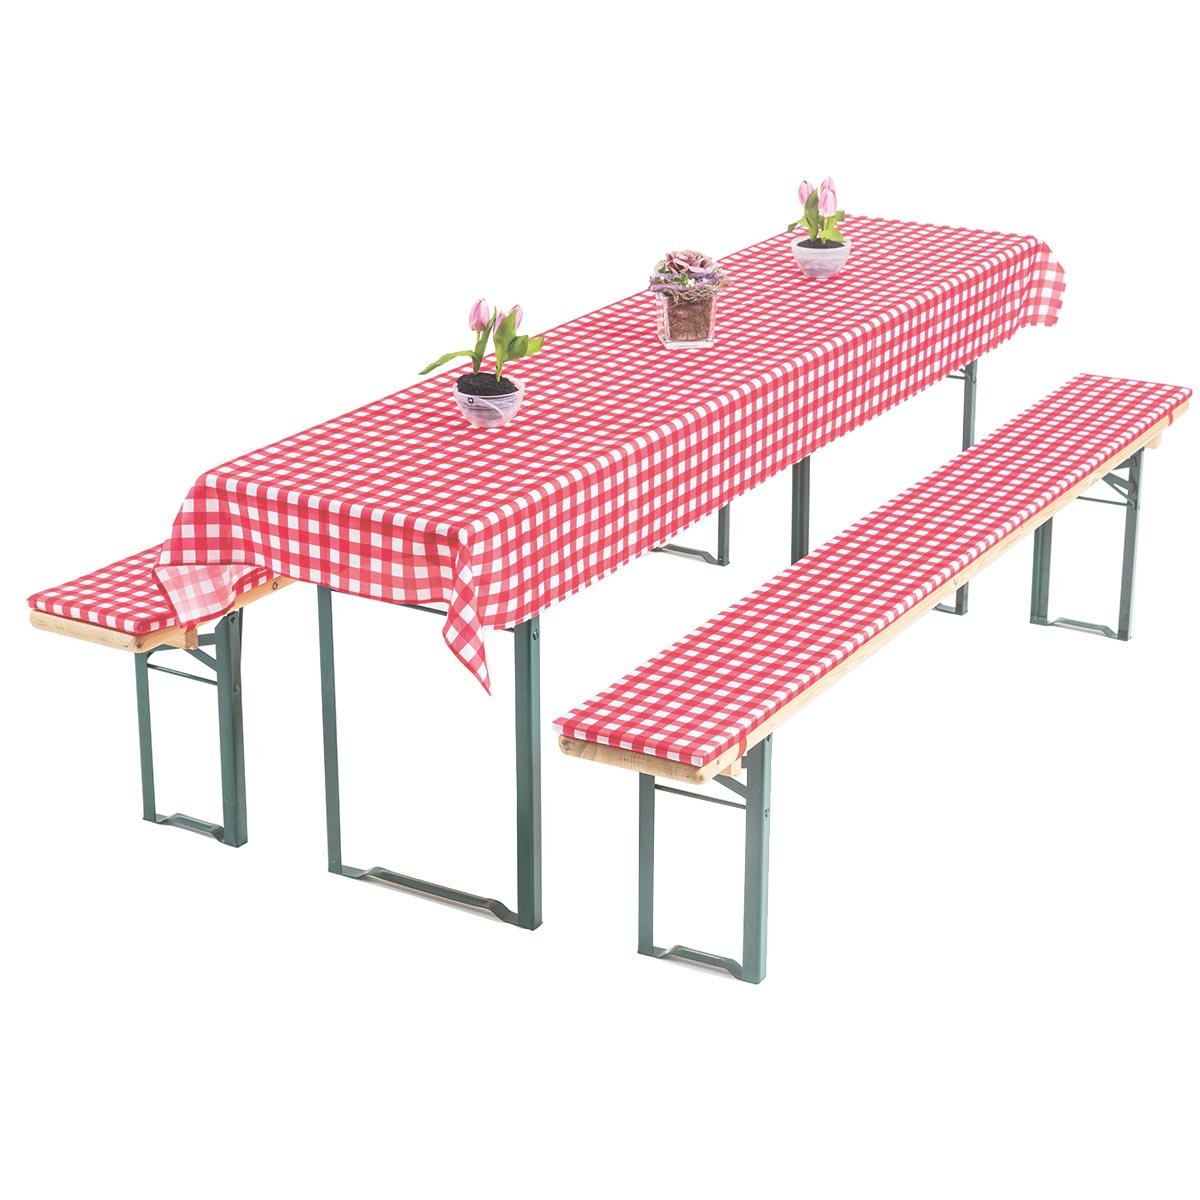 graefe stayn Annabelle birra tavolo di cuscini set 3pezzi per birra birreria–70cm o 50cm larghezza tavolo–Oeko-Tex Standard 100, rosso/bianco, 50 x 220 cm Torrex